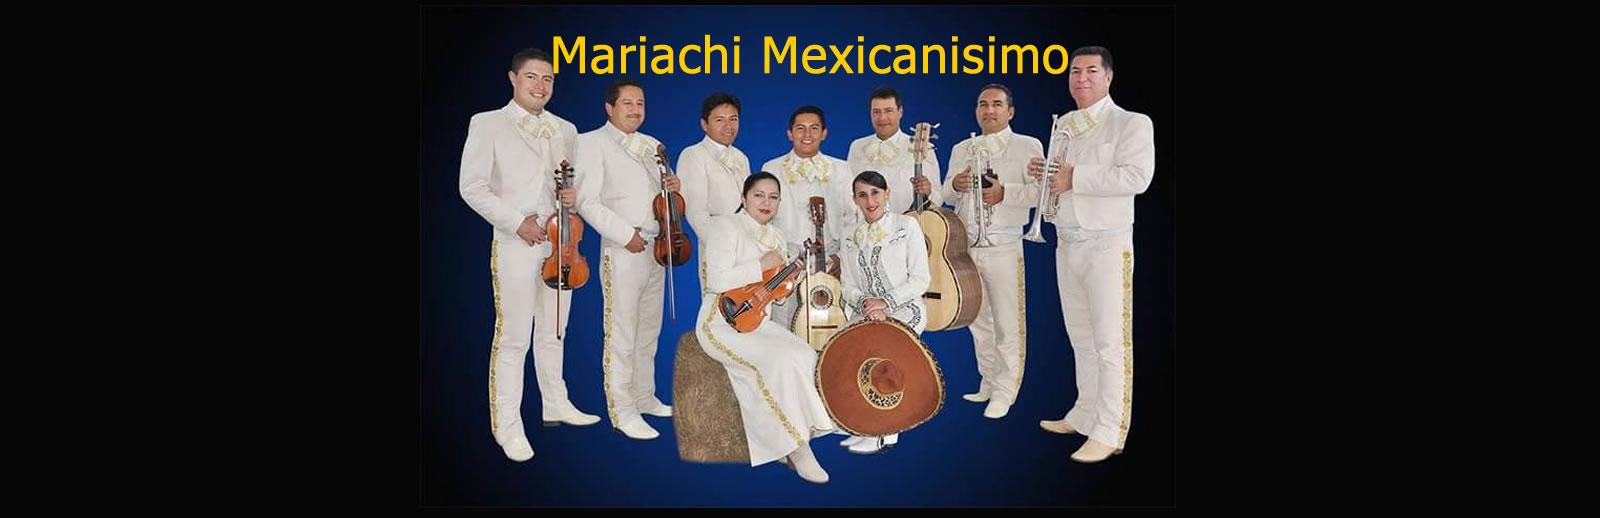 Mariachimexicanisimo